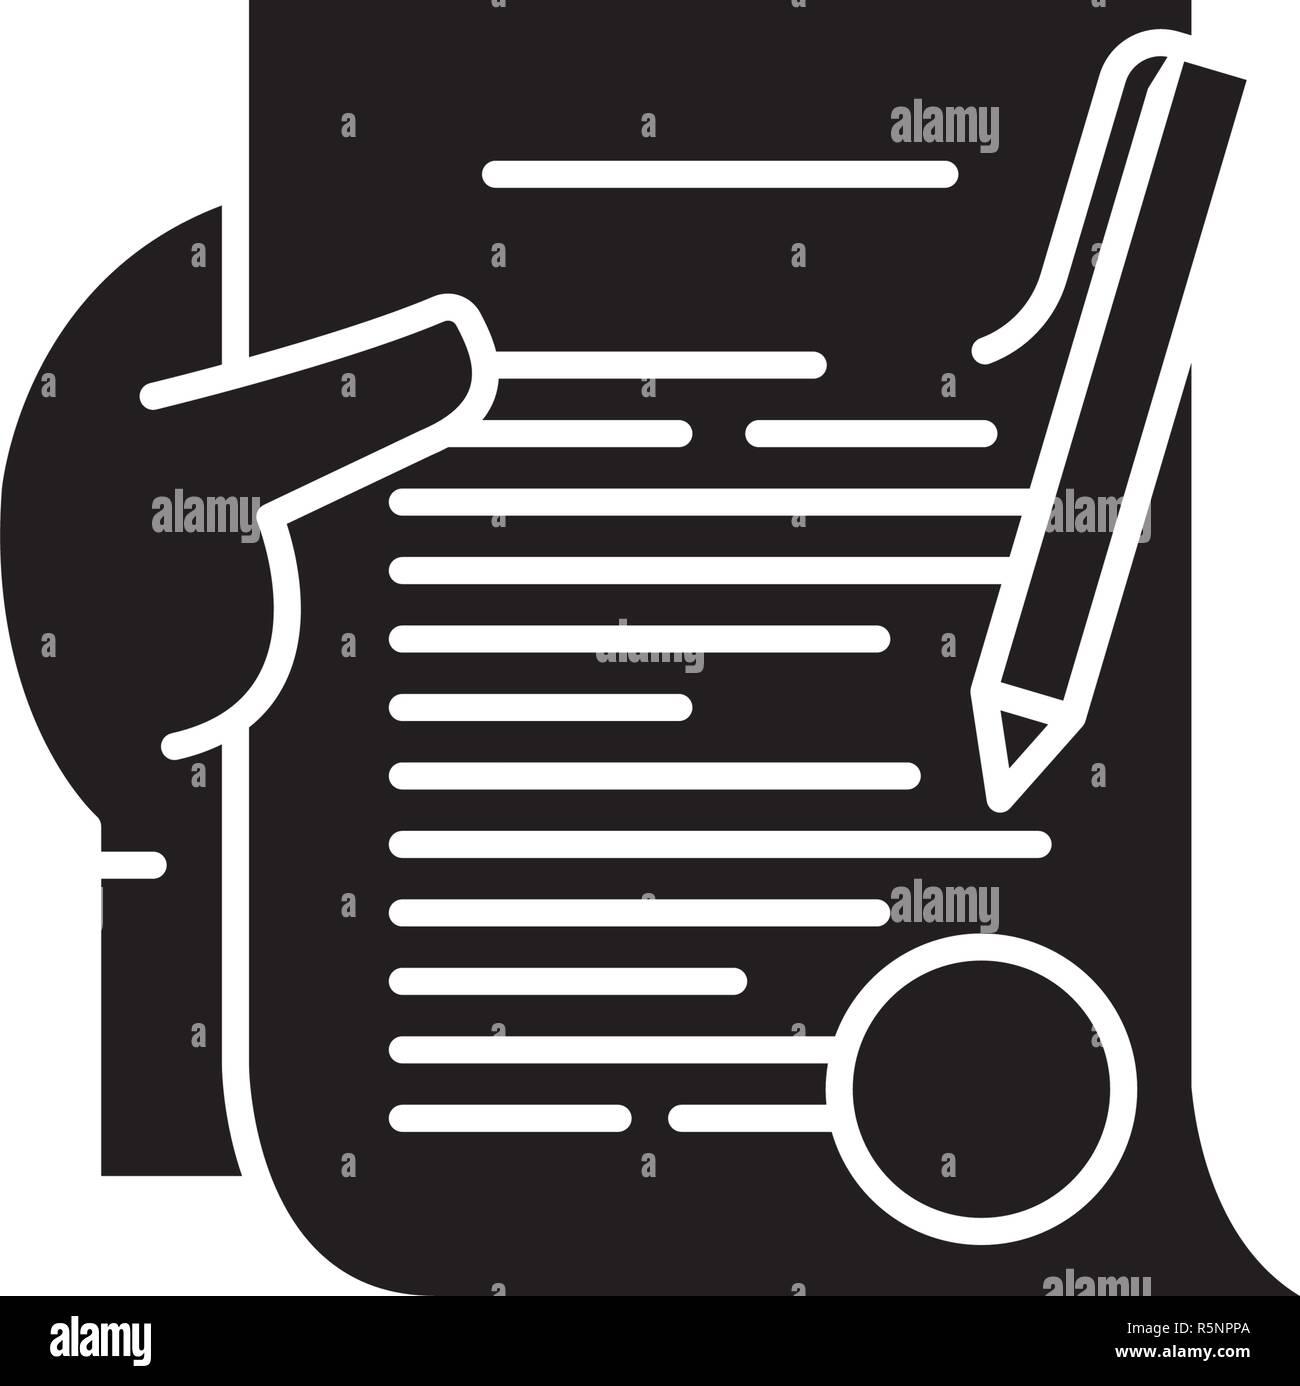 Compromiso icono negro, signo de vectores de fondo aislados. Concepto de compromiso símbolo, ilustración Imagen De Stock